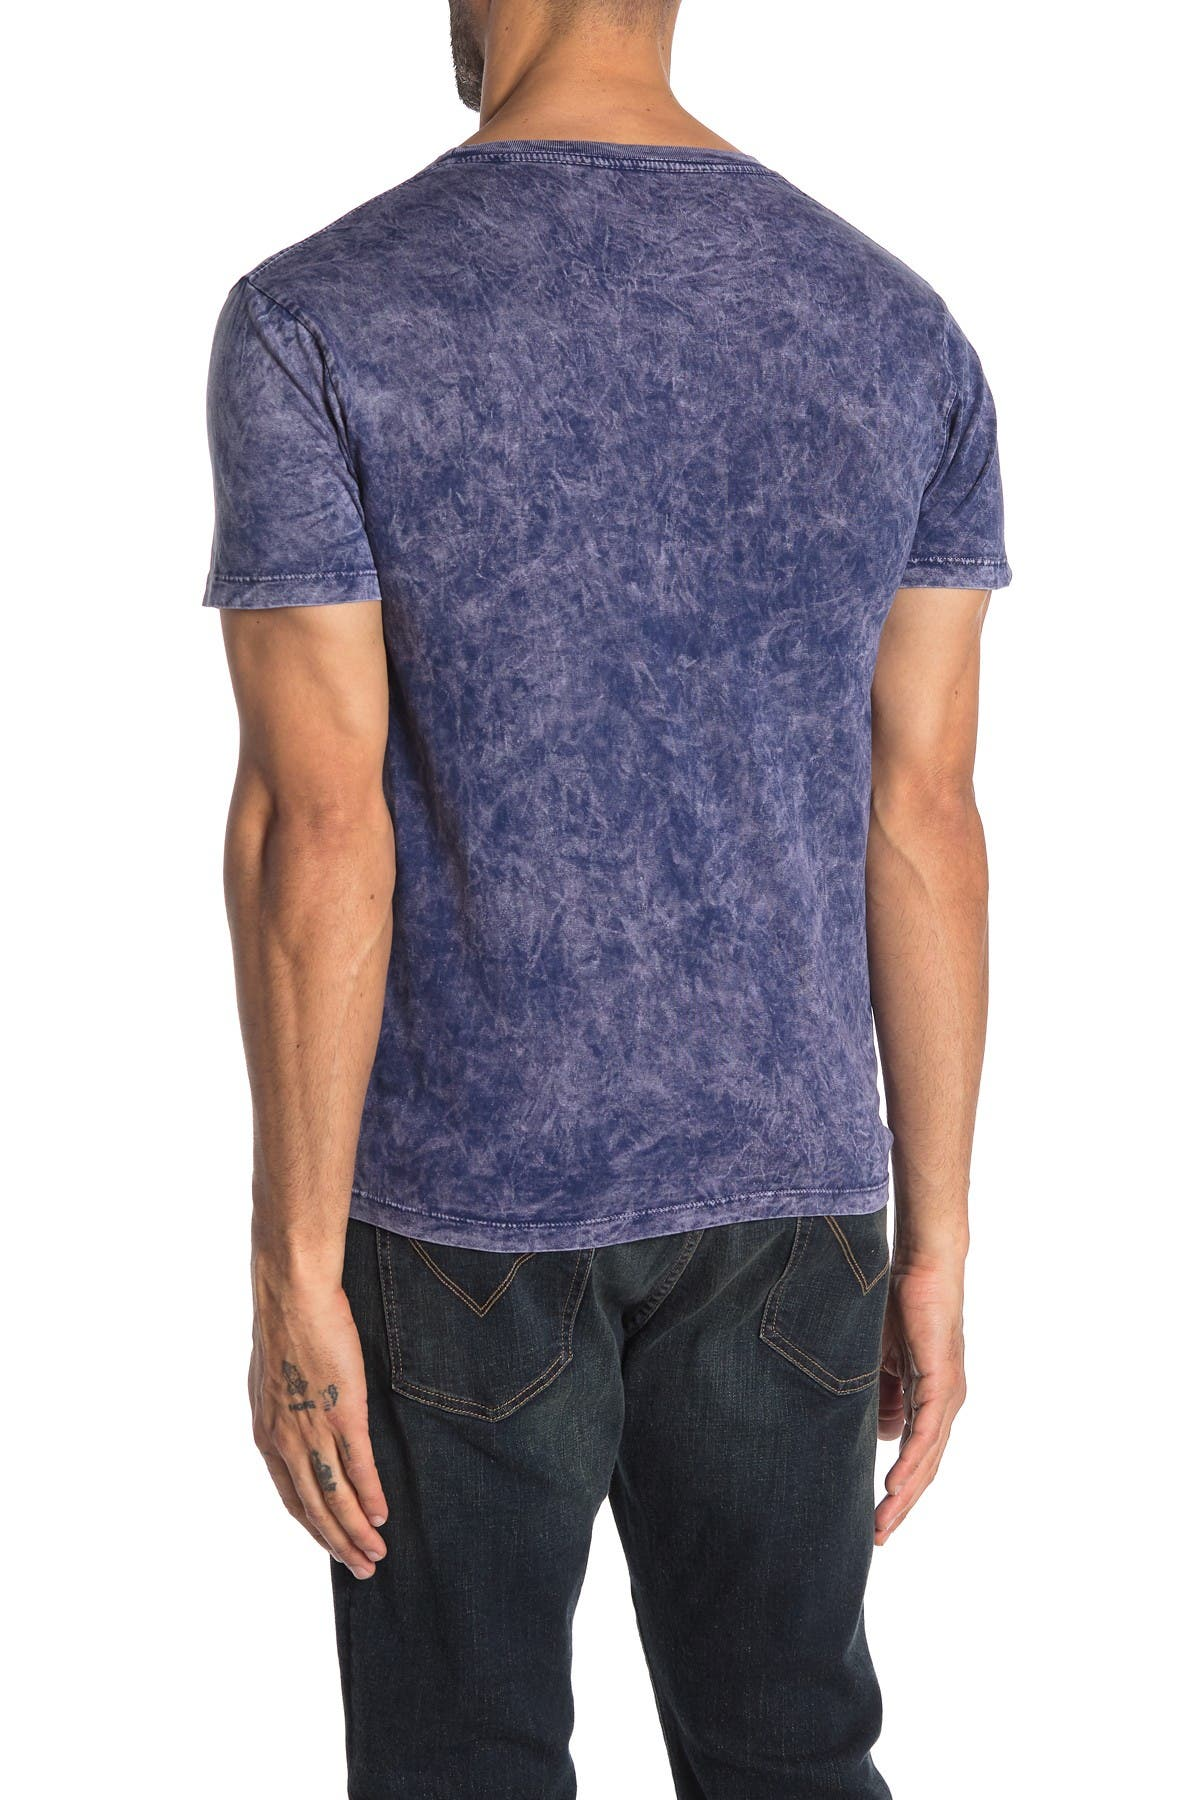 Image of Original Paperbacks South Sea Mineral Crew Neck T-Shirt